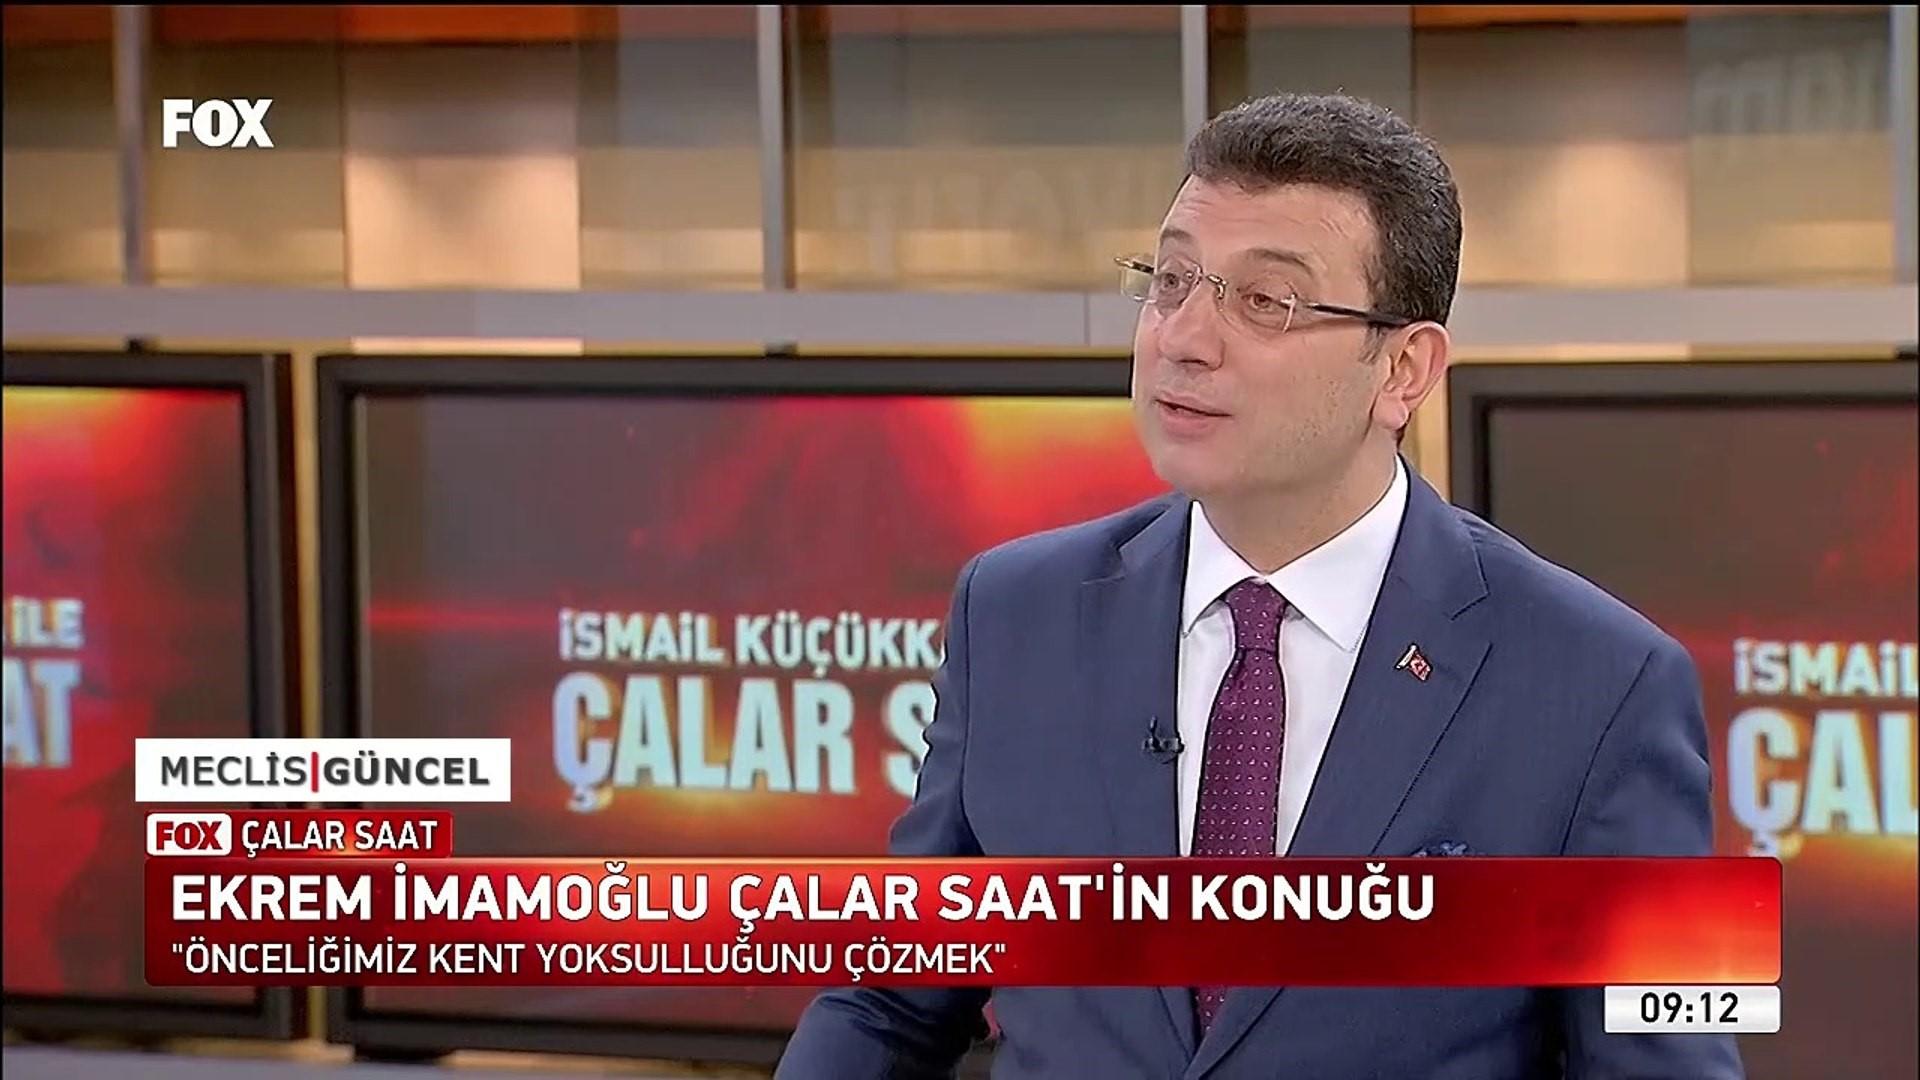 Ekrem İmamoğlu uhd wallpaper